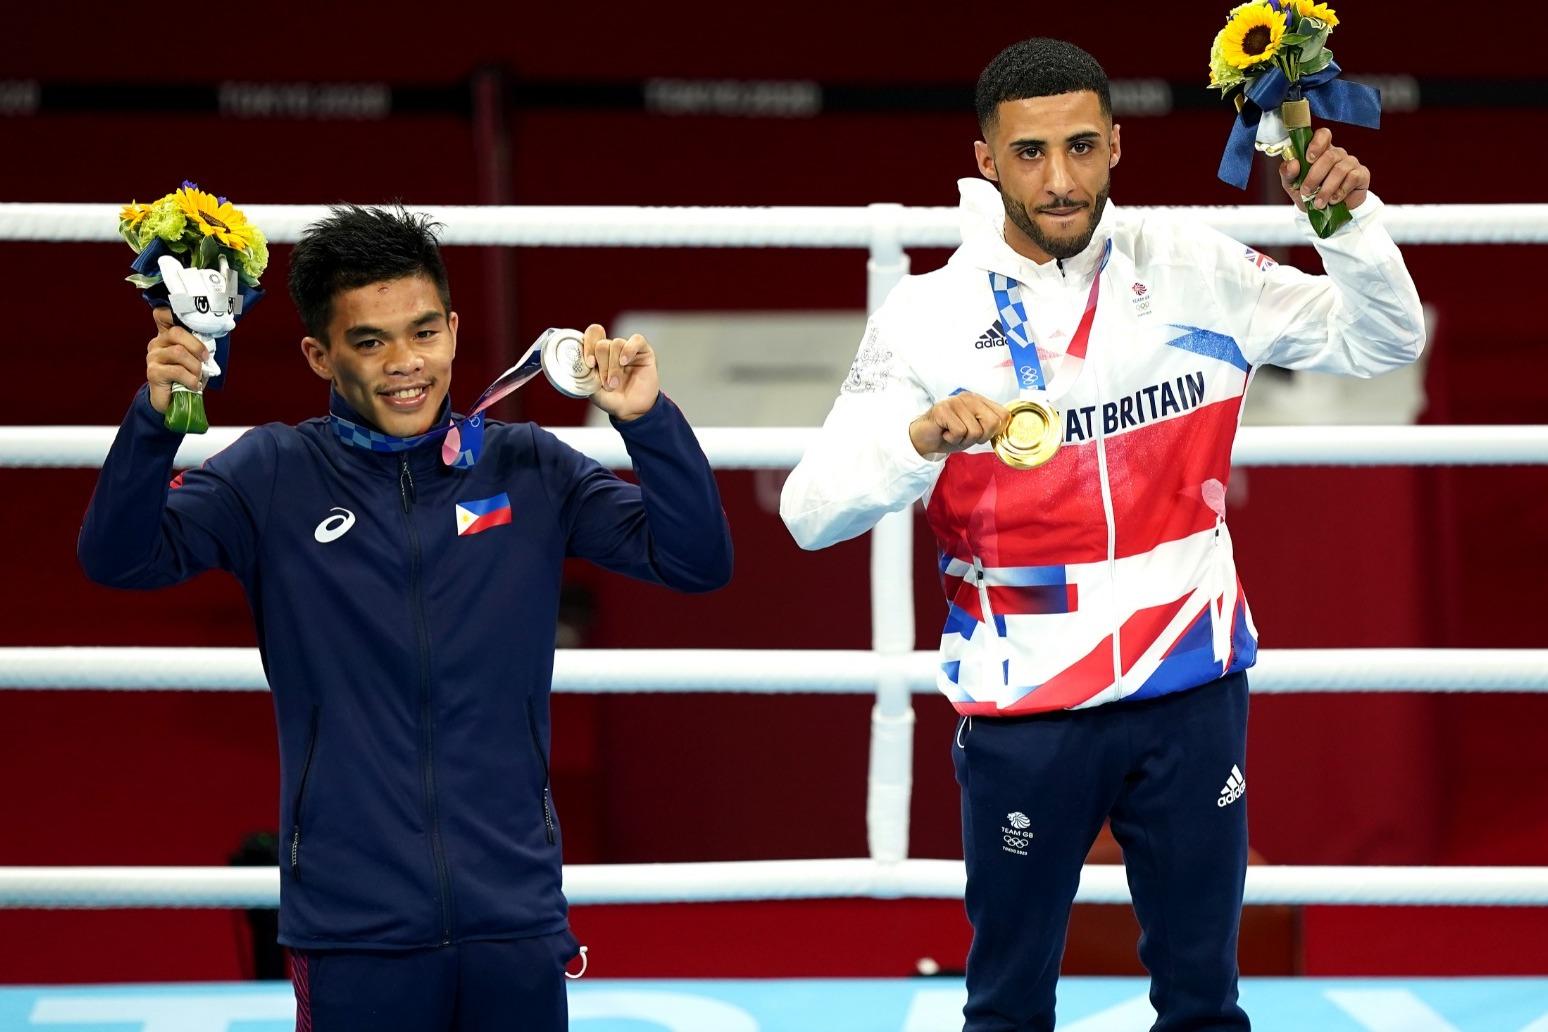 Galal Yafai wins flyweight boxing gold for Great Britain